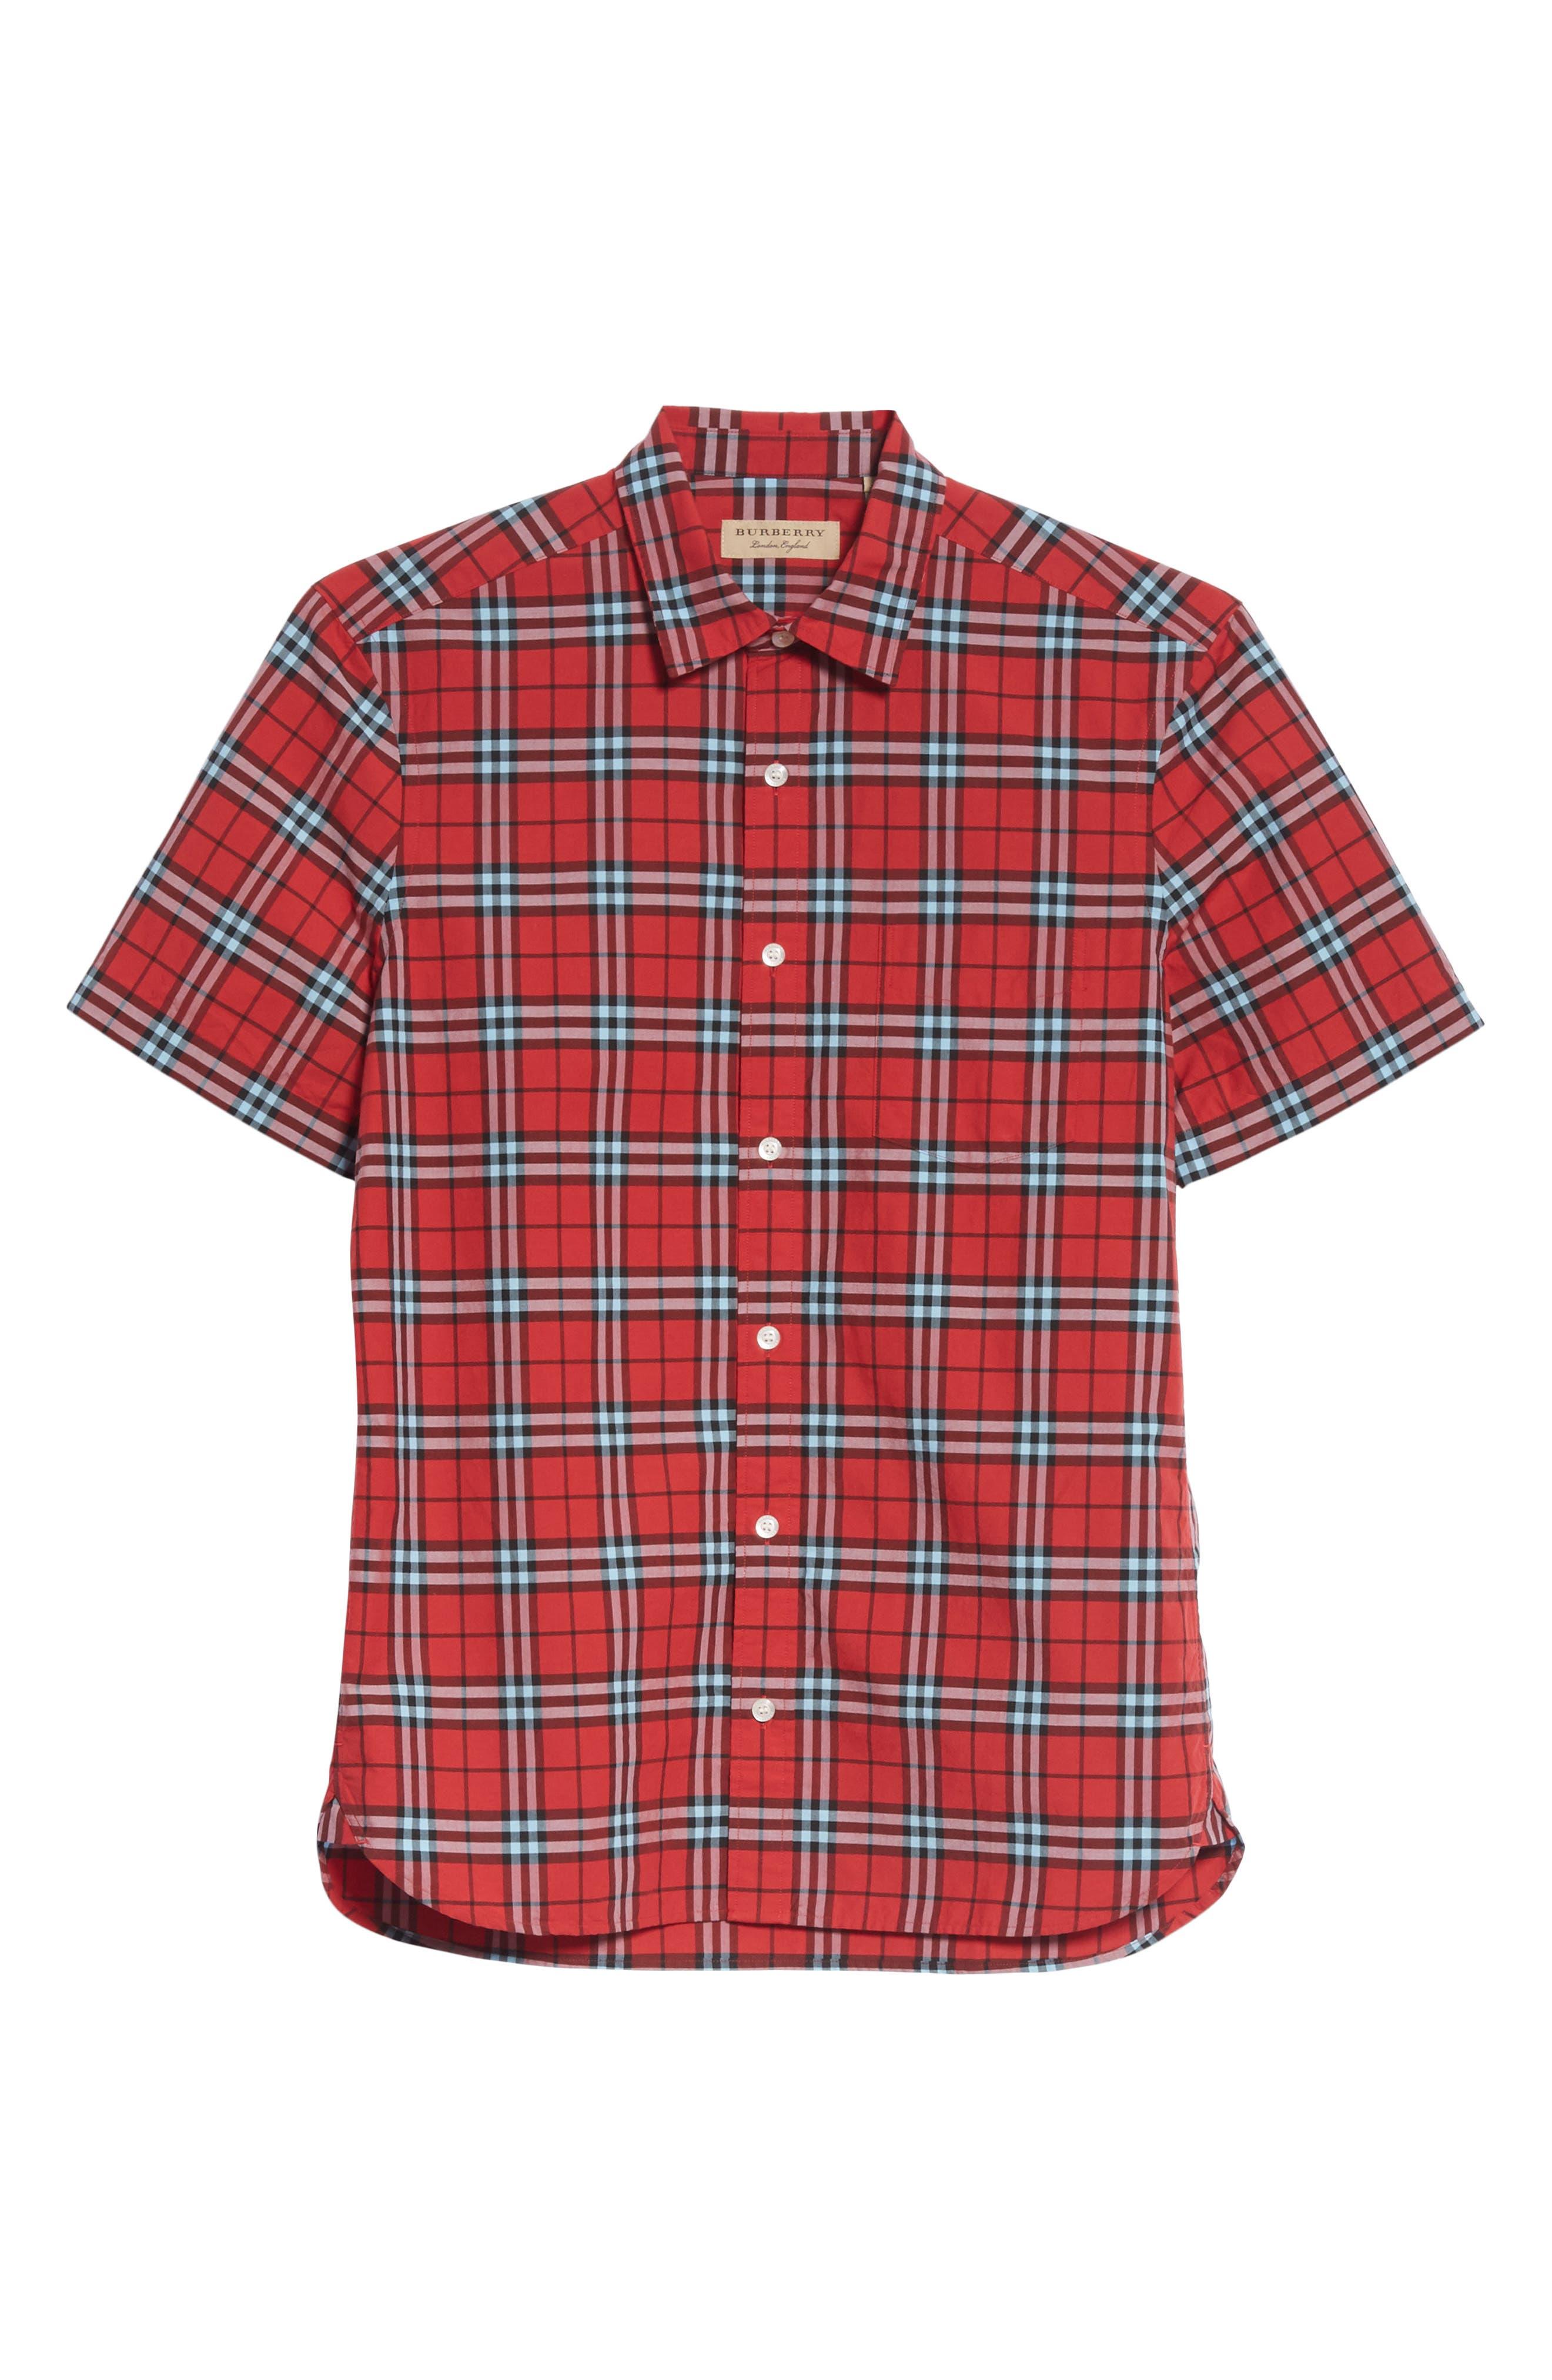 Alexander Check Sport Shirt,                             Alternate thumbnail 6, color,                             BRIGHT RED